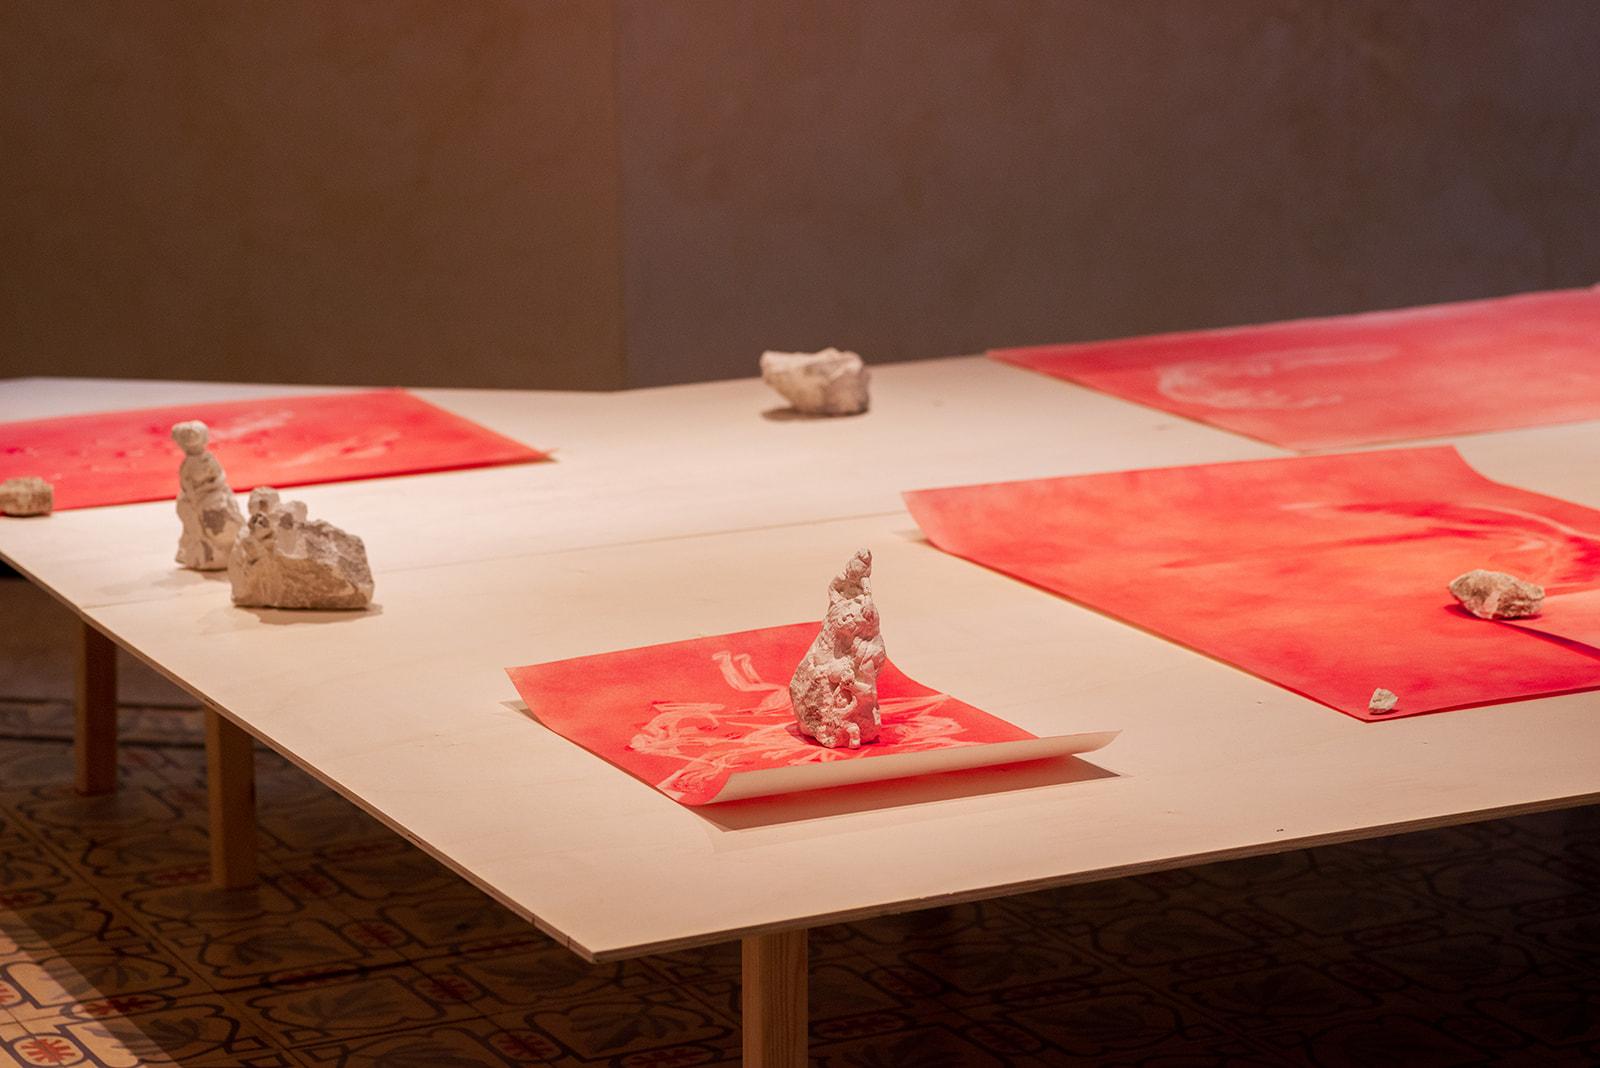 Naama Lindenbaum, Sediments, 2021, pigment on paper, chalk<br /> Photography: Neta Cones